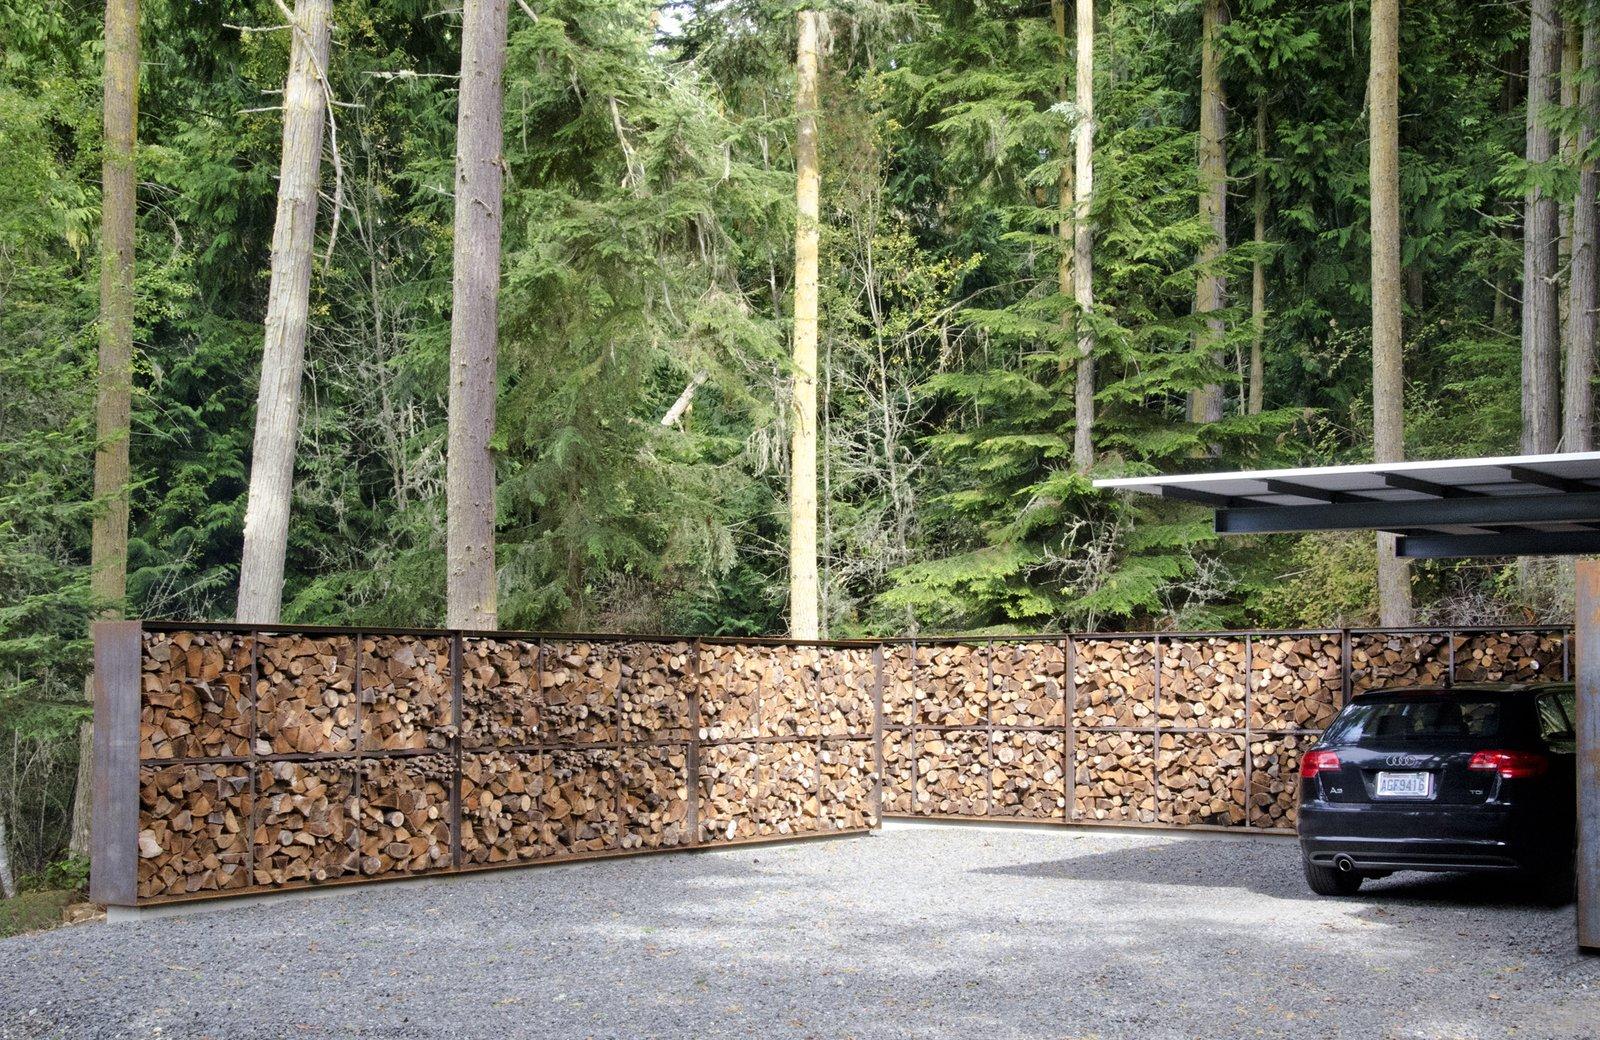 carport/wood storage  Villa Lucy Carport by katherine wesselman